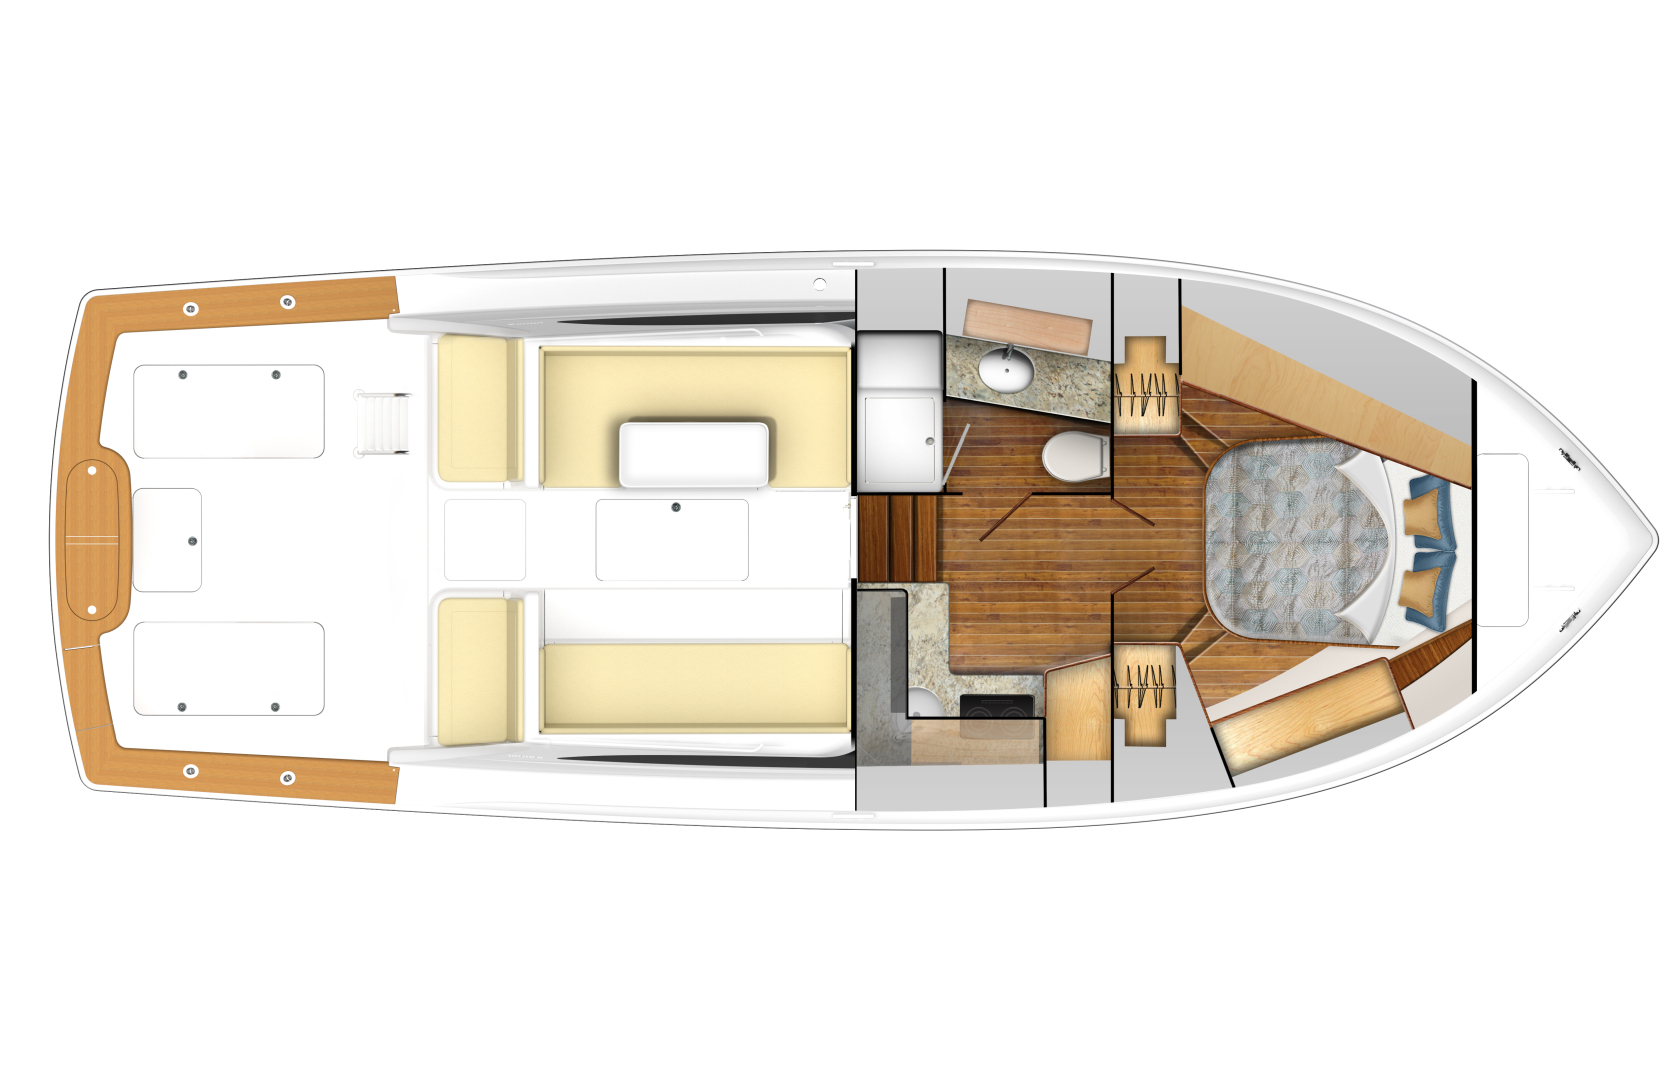 Viking 38 - Option #1 Deck/Cabin Layout